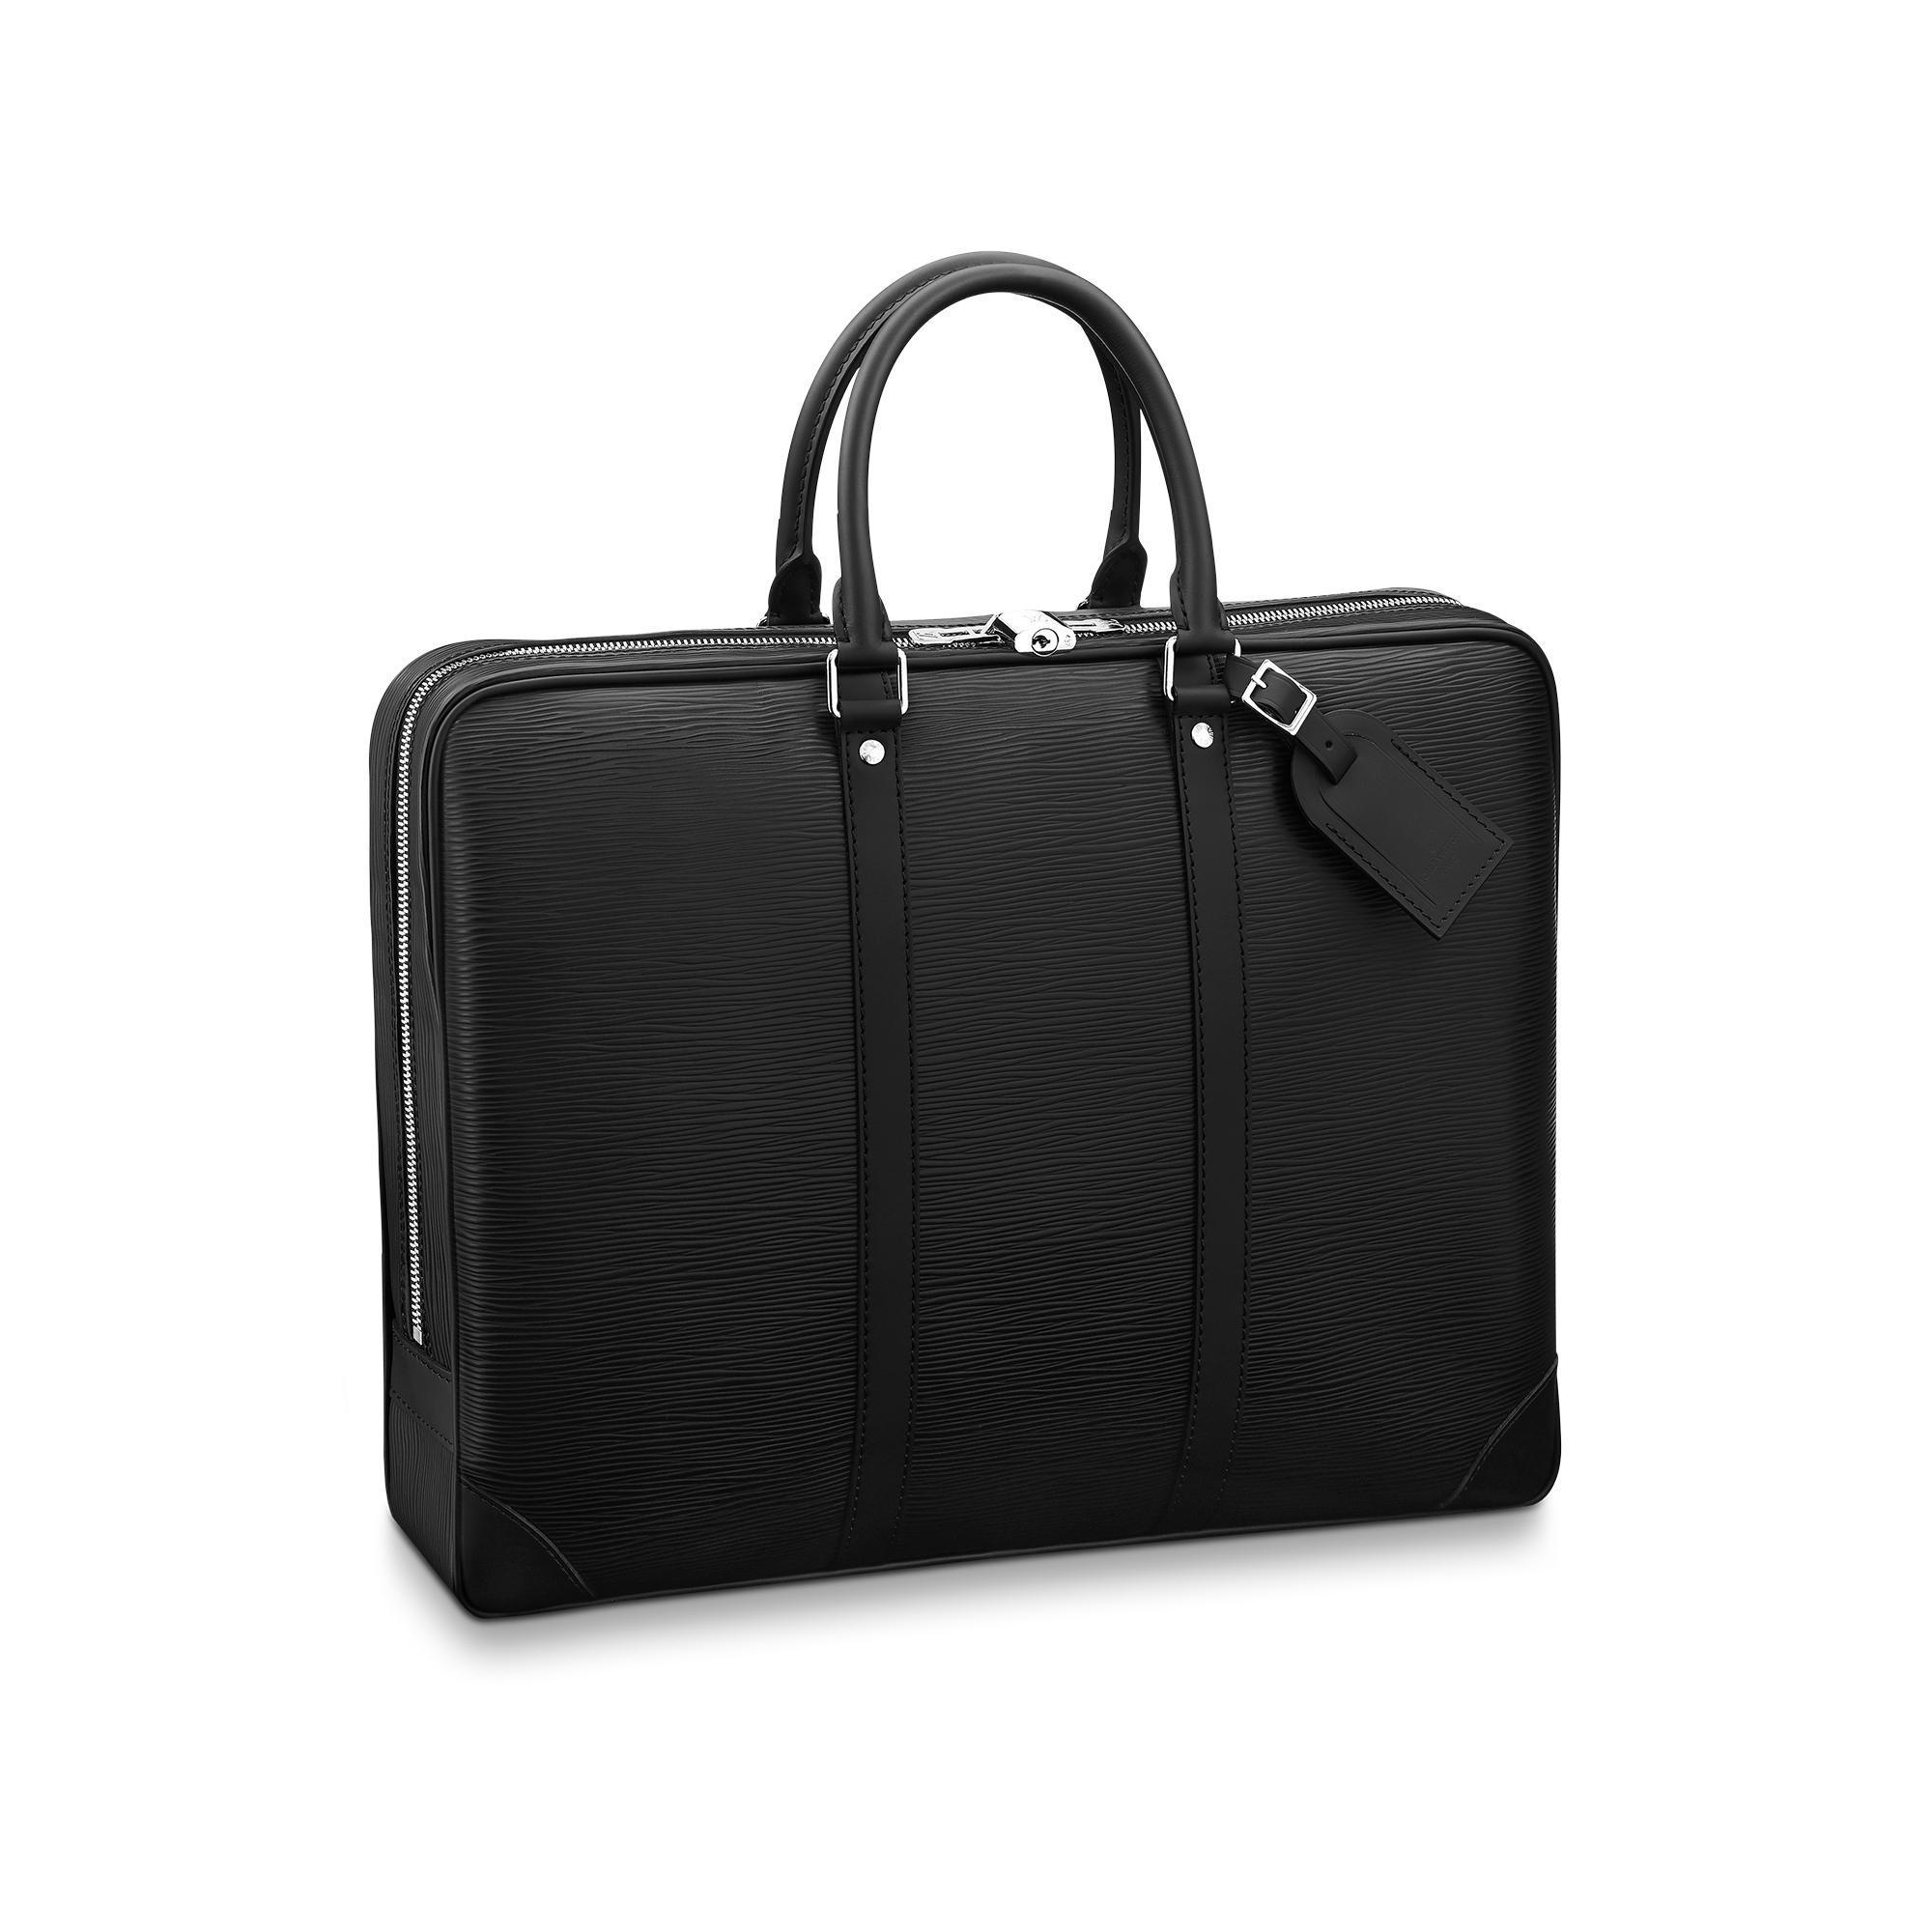 c98b39bfee6 Louis Vuitton Mens Sports Bag   ReGreen Springfield